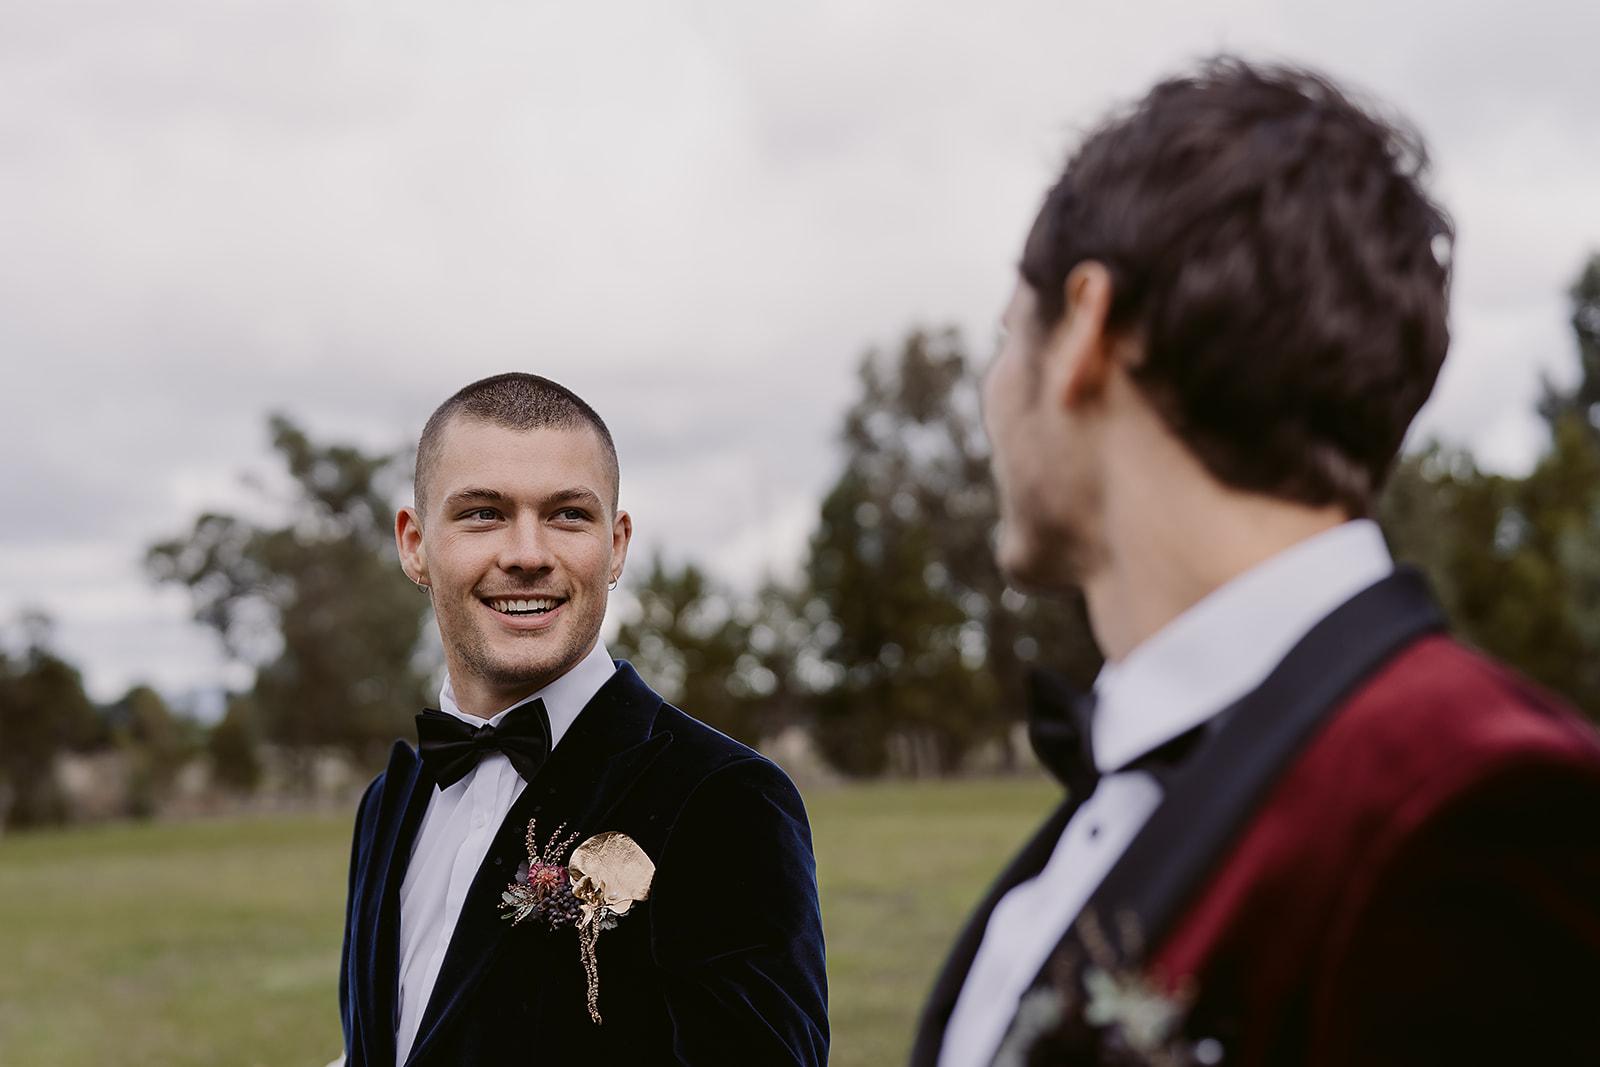 Immerse_Yarra_Valley_Same_Sex_Wedding_-_Ashleigh_Haase_Photography-158.jpg